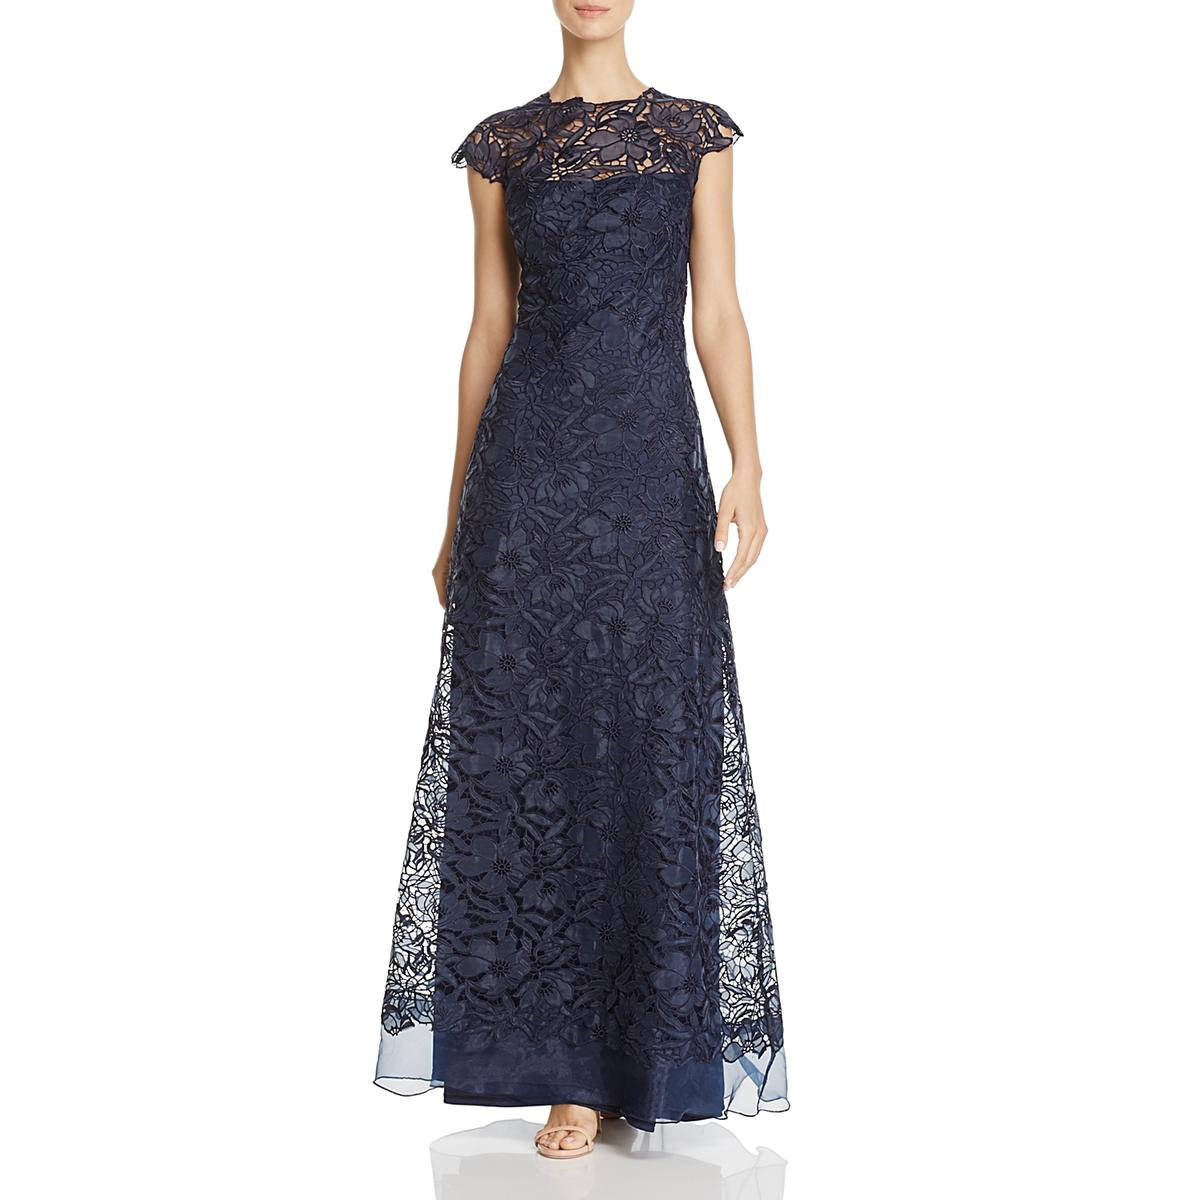 tadashi shoji dresses on sale